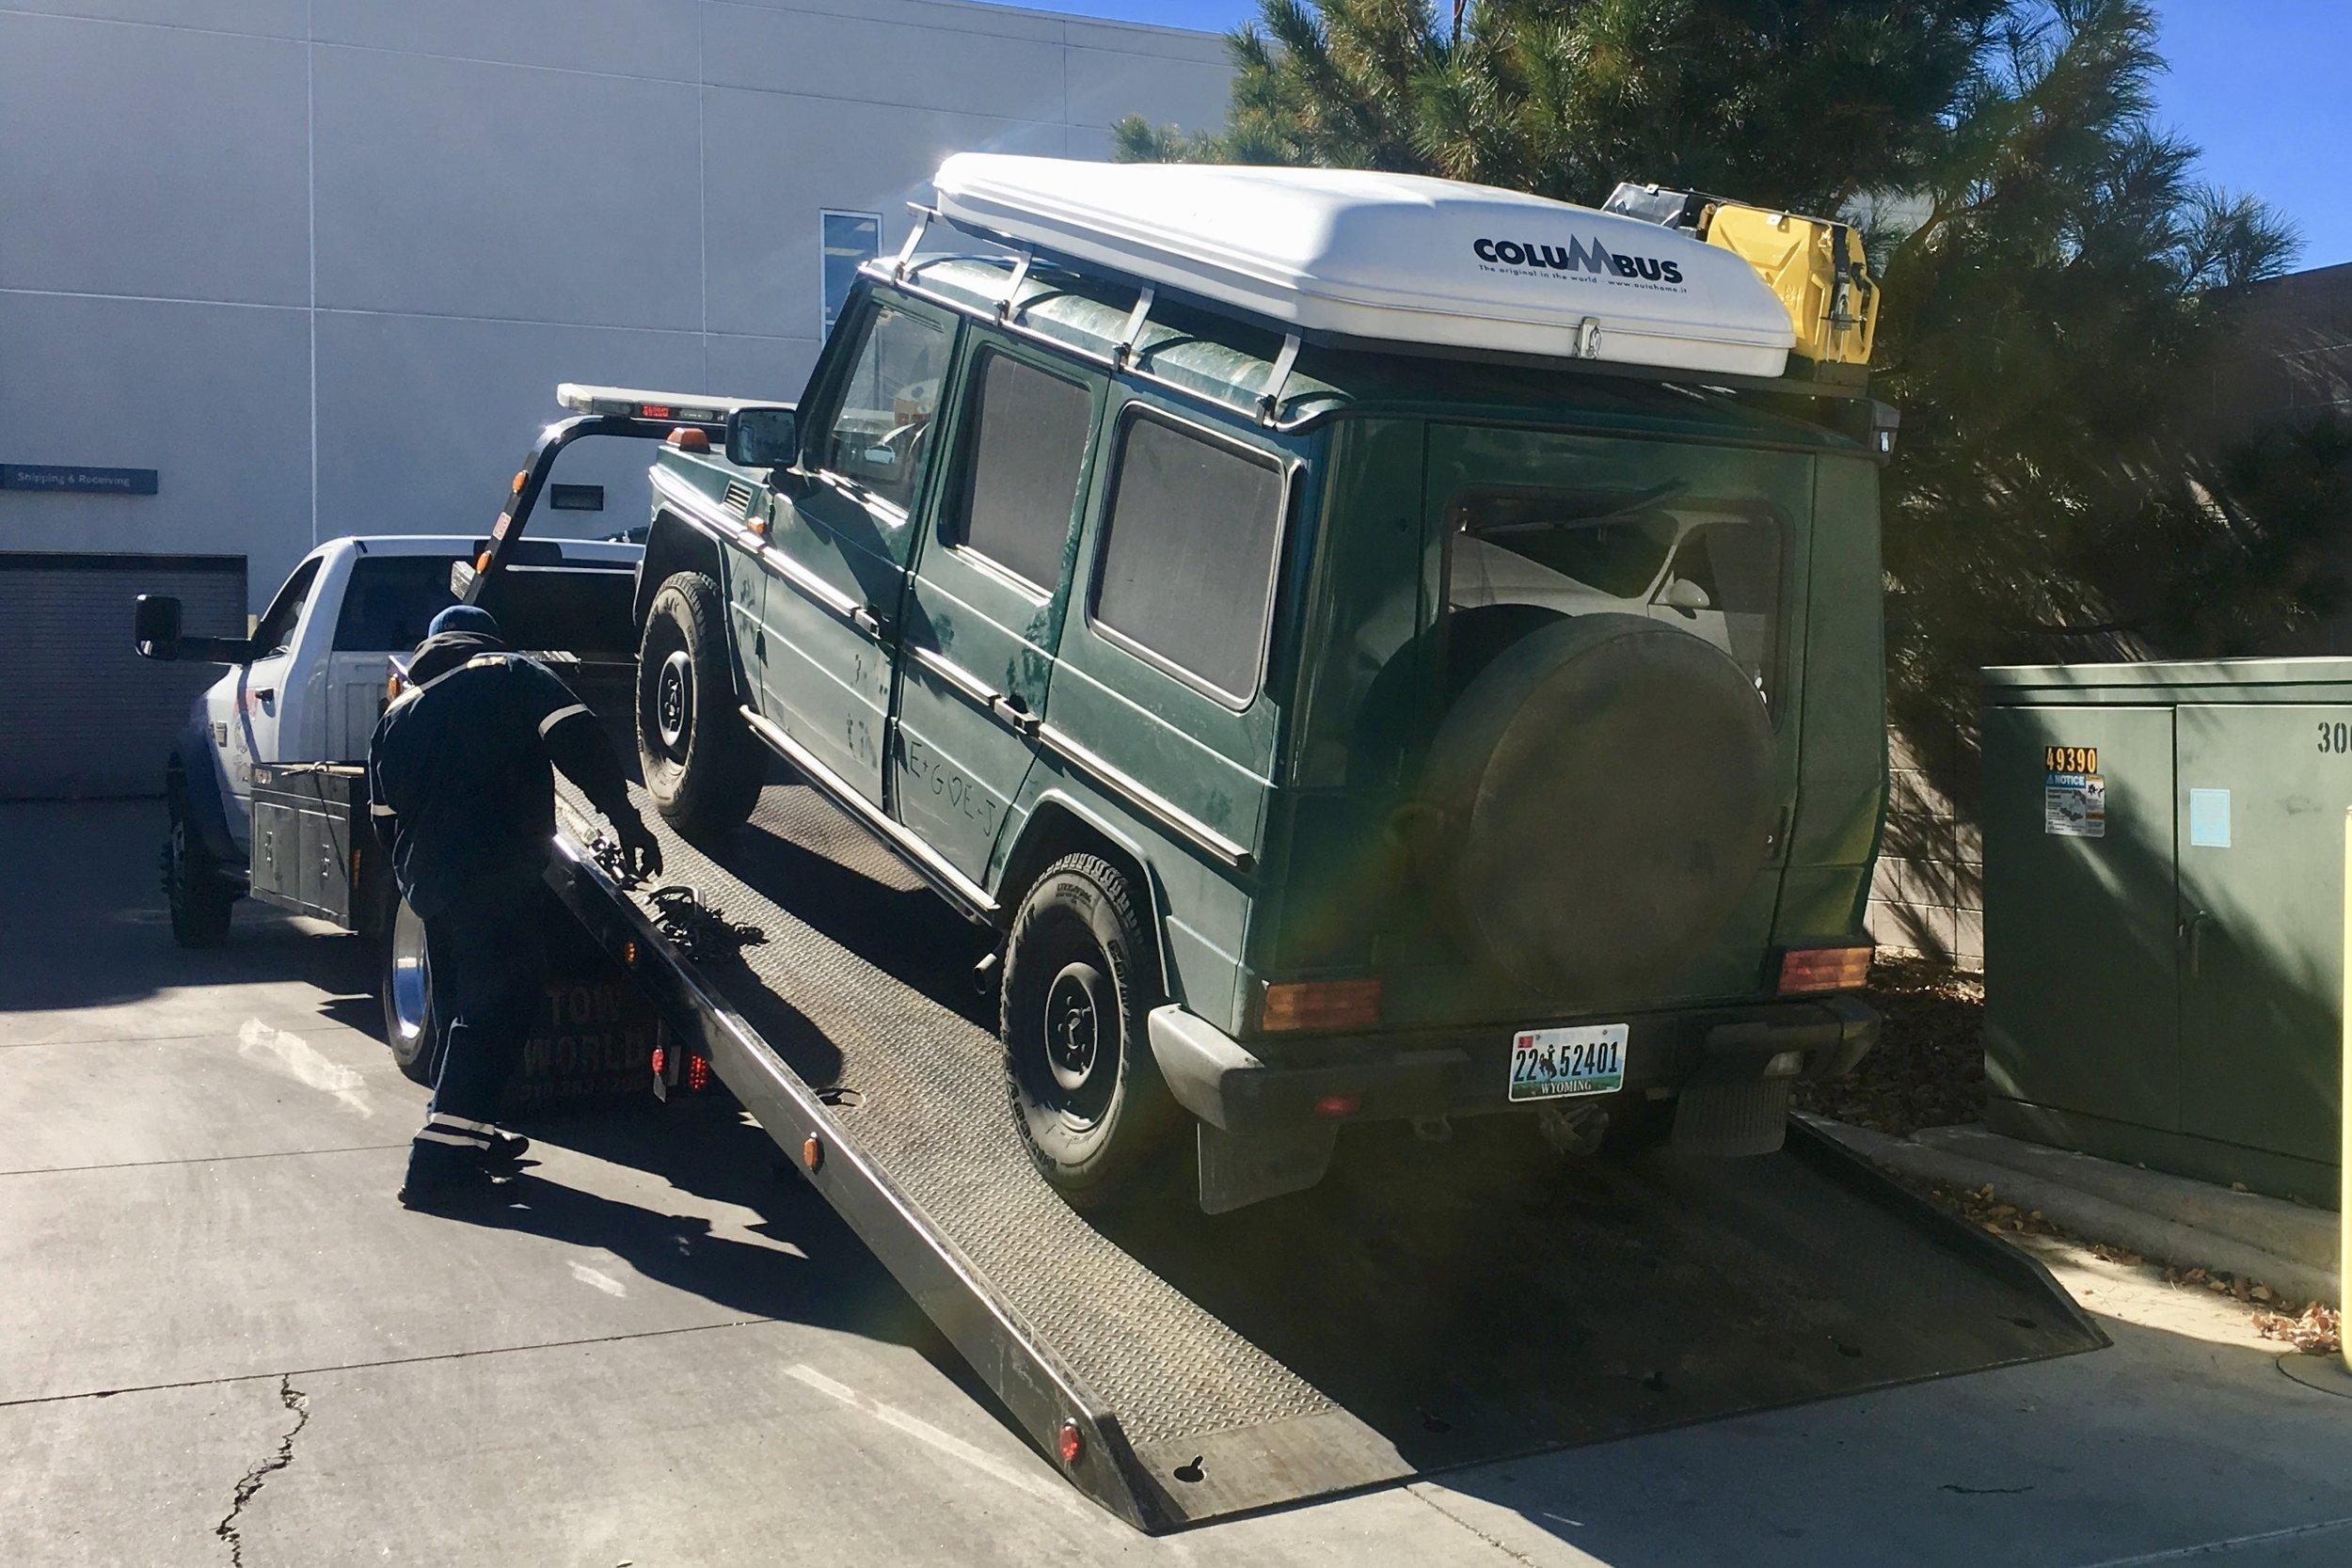 Glenda gets towed...twice!